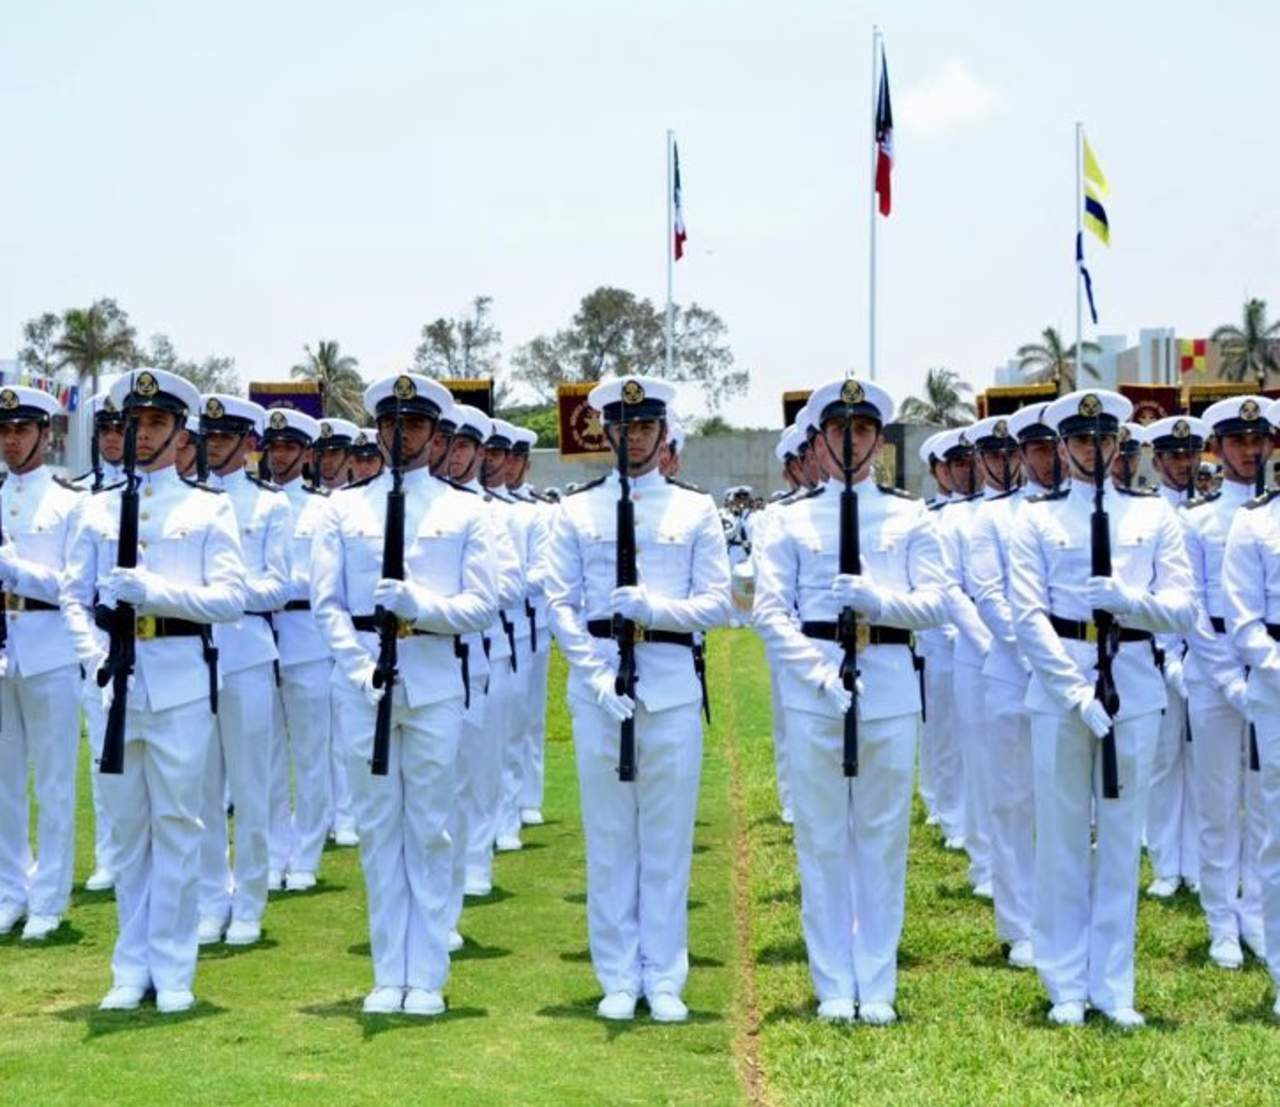 1942 se celebra un d a de la marina por primera ocasi n for Noticias del espectaculo mexicano del dia de hoy